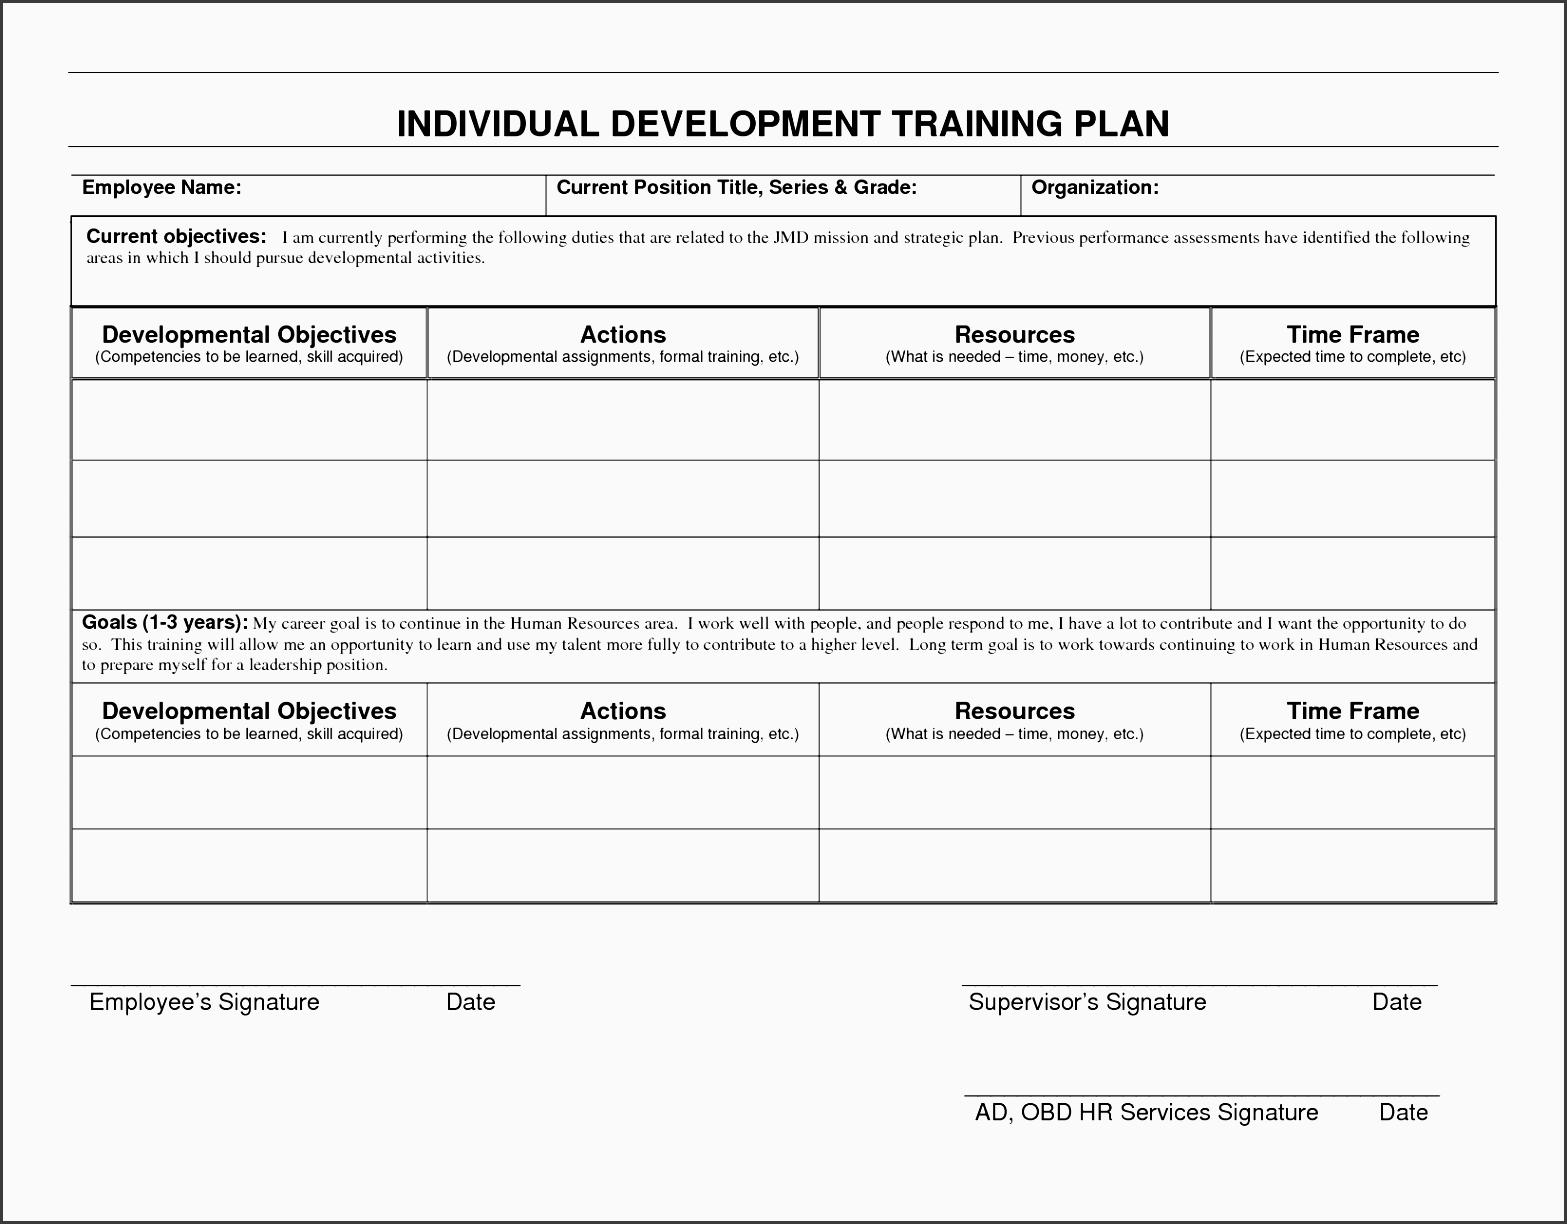 employee personal development plan template employee personal development plan template